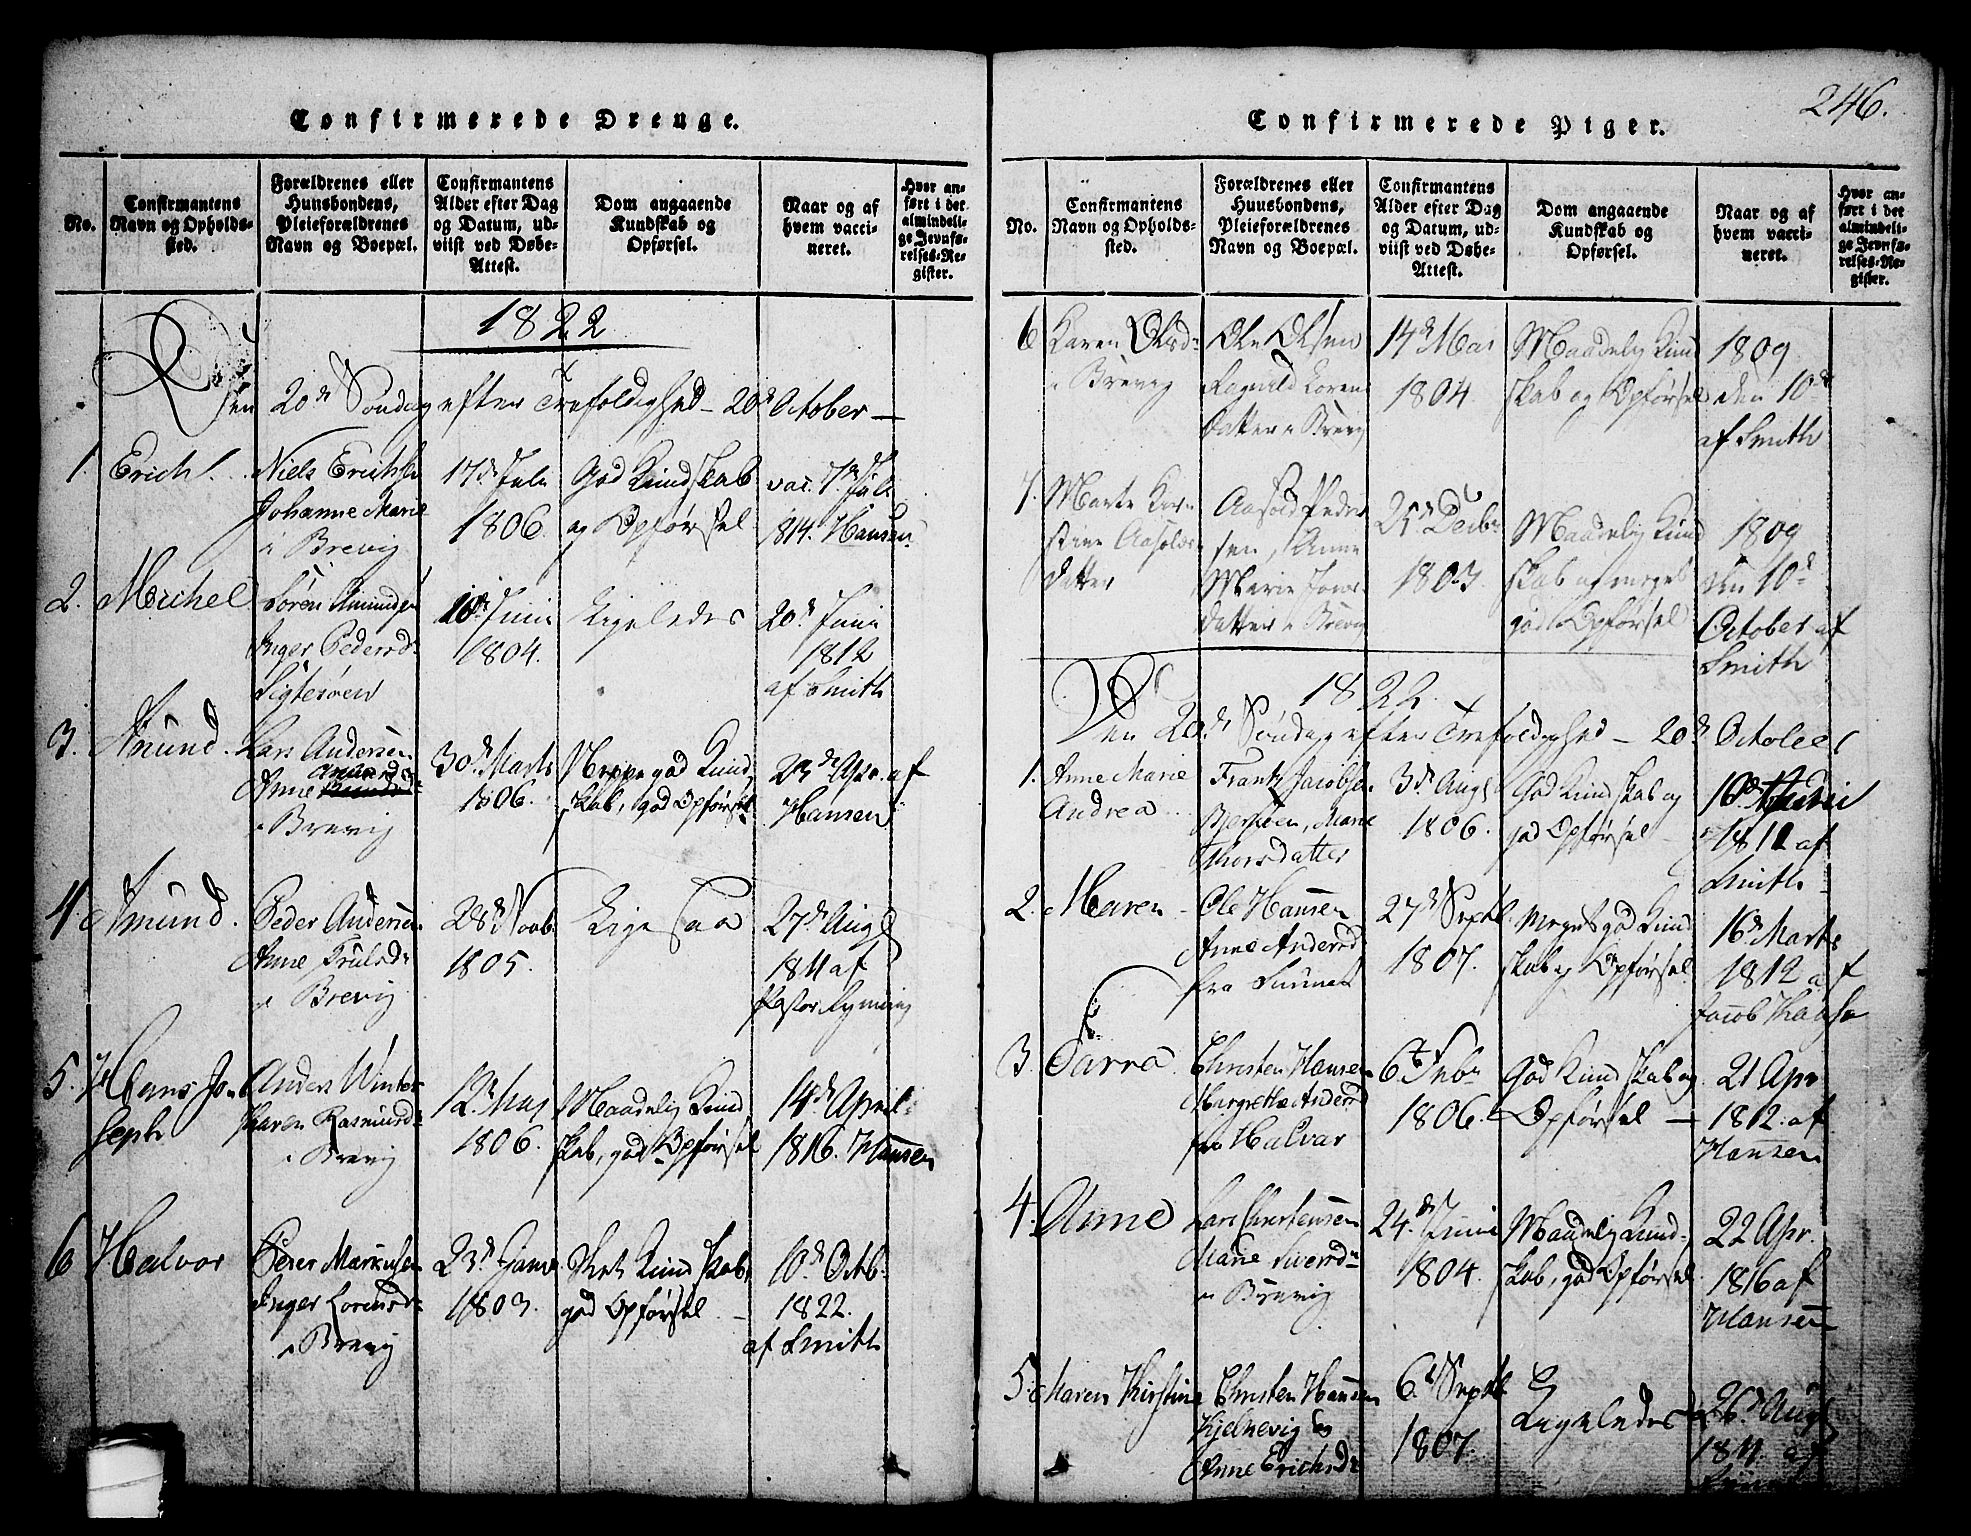 SAKO, Brevik kirkebøker, G/Ga/L0001: Klokkerbok nr. 1, 1814-1845, s. 246